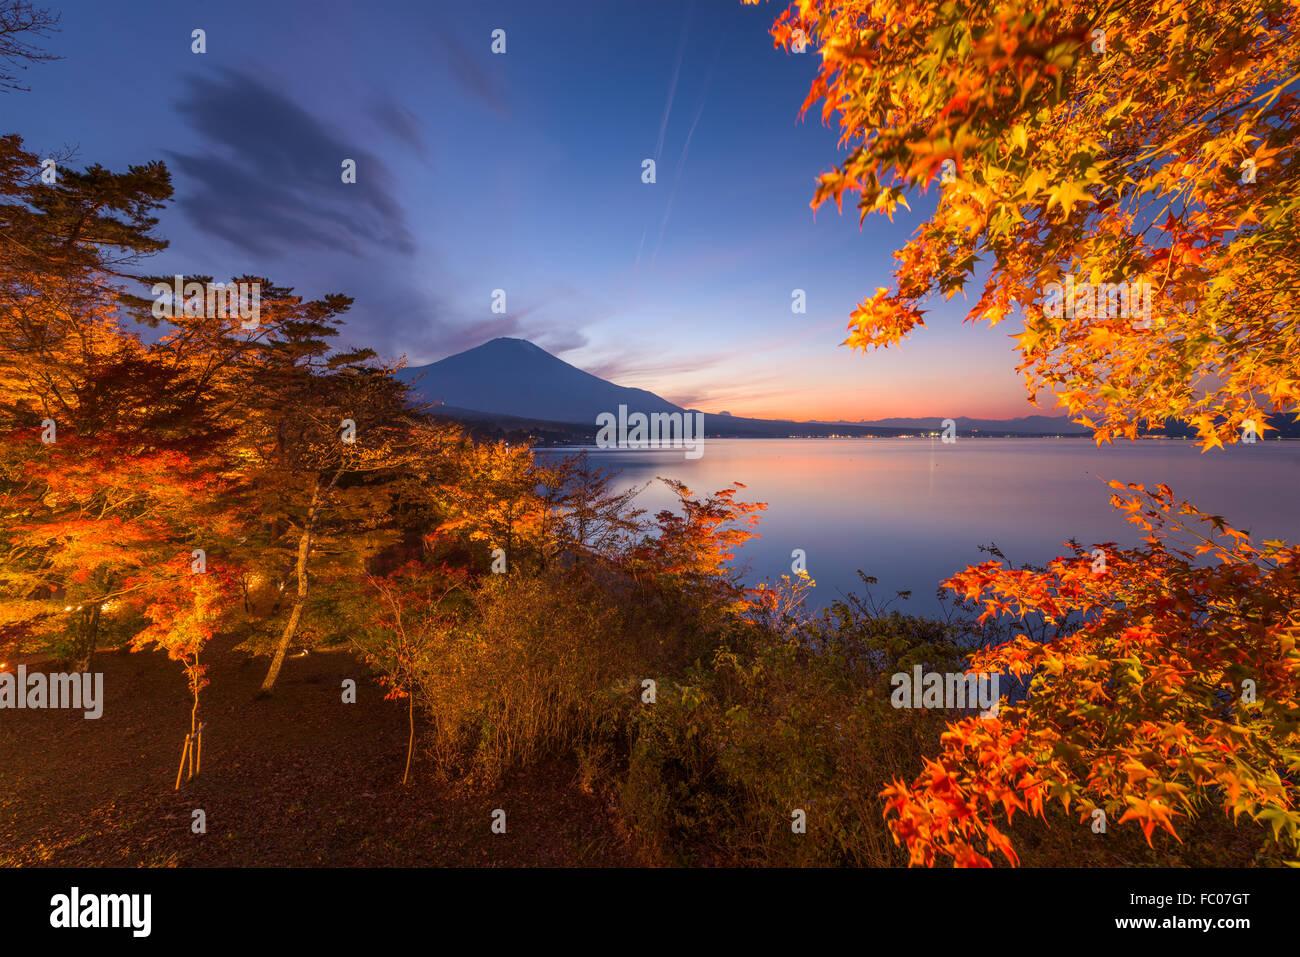 Mt. Fuji, Japan im Herbst vom Ufer des Sees Yamanaka. Stockbild